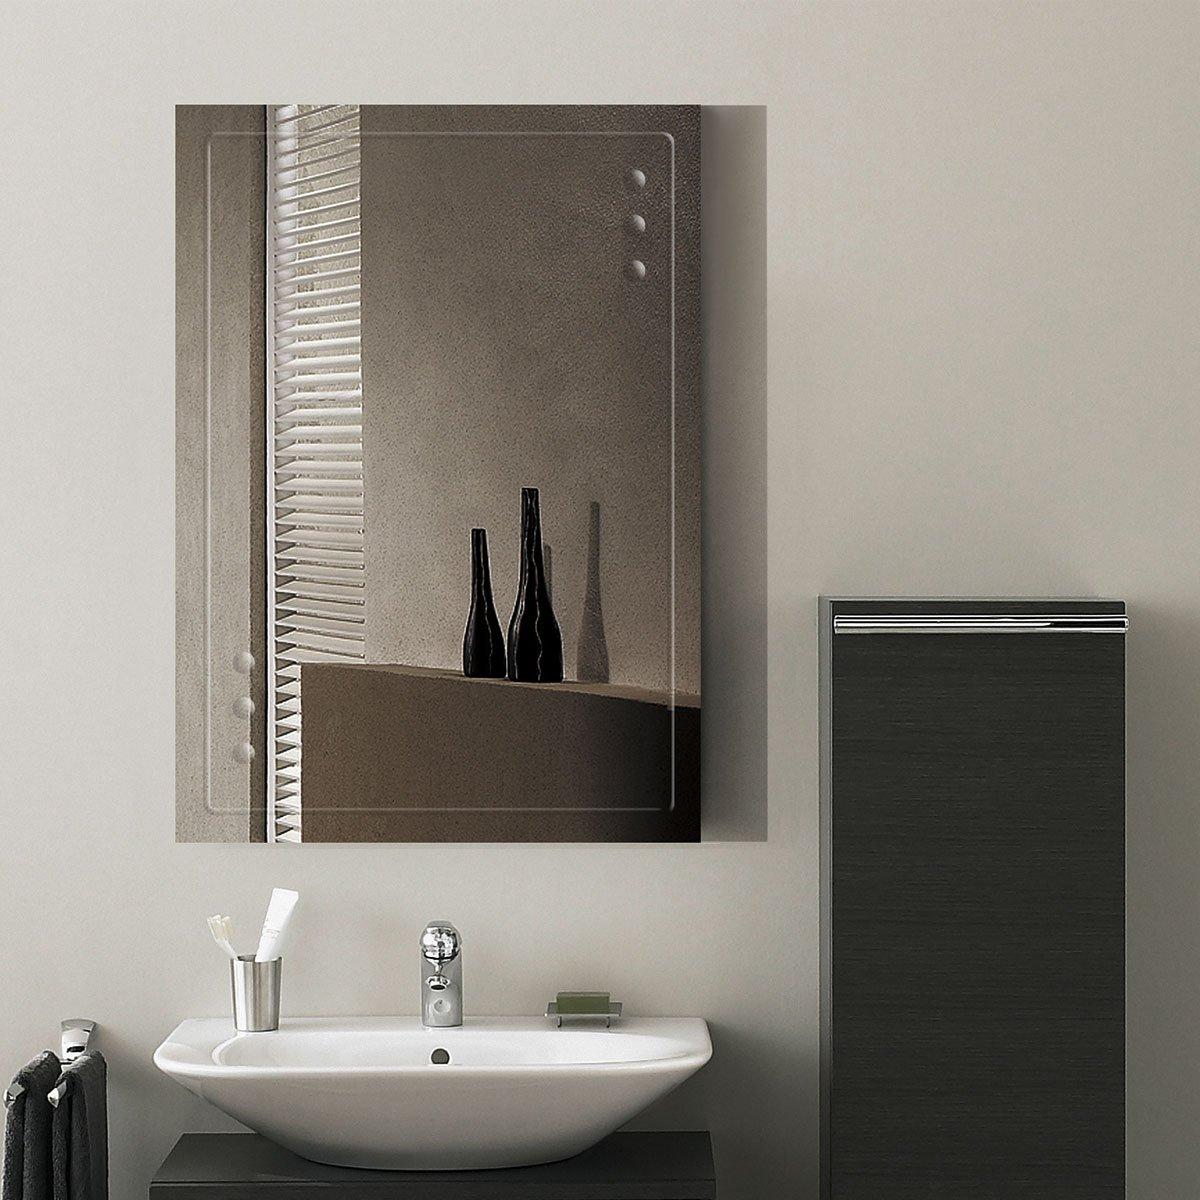 DECORAPORT 28''20'' Frameless Wall-mounted Bathroom Silvered Mirror Rectangle Vertical Vanity Mirror (A-B047B)